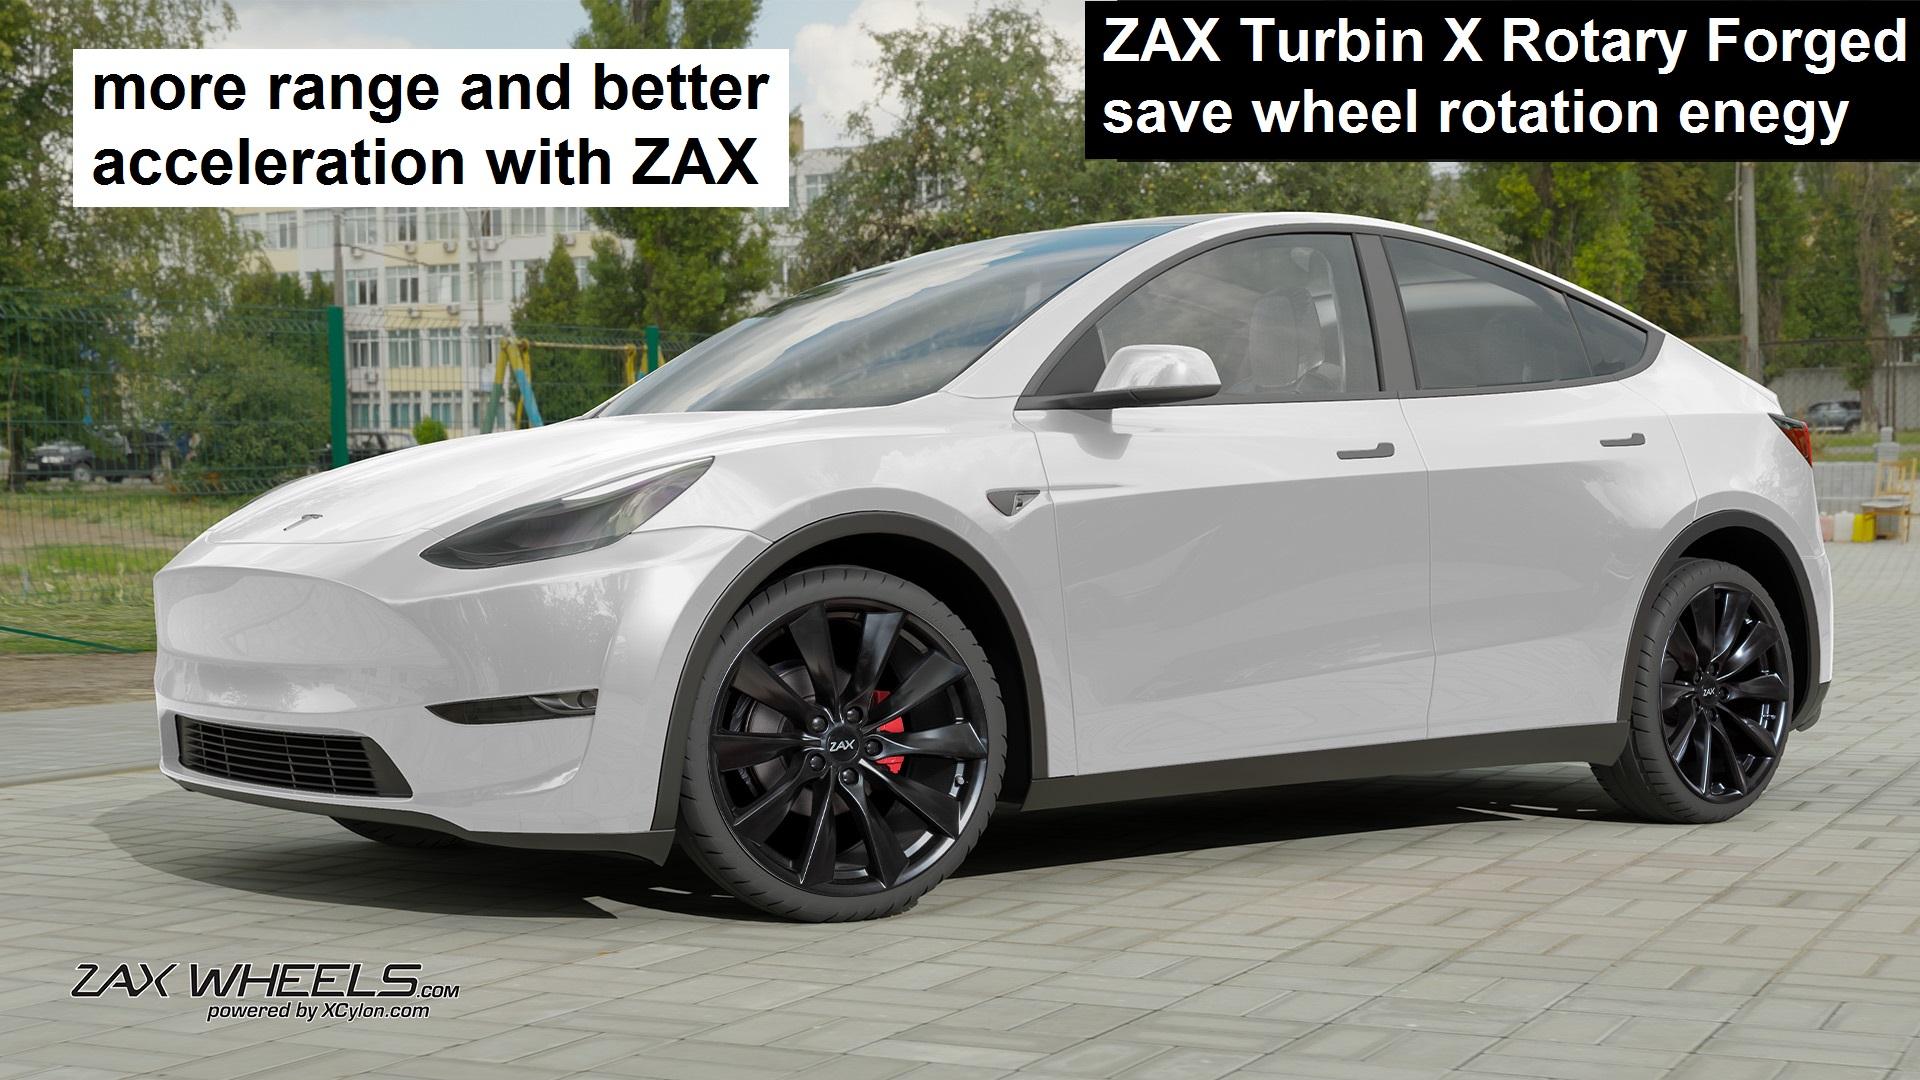 tesla-model-y-wheels-winter-tires-black-zax